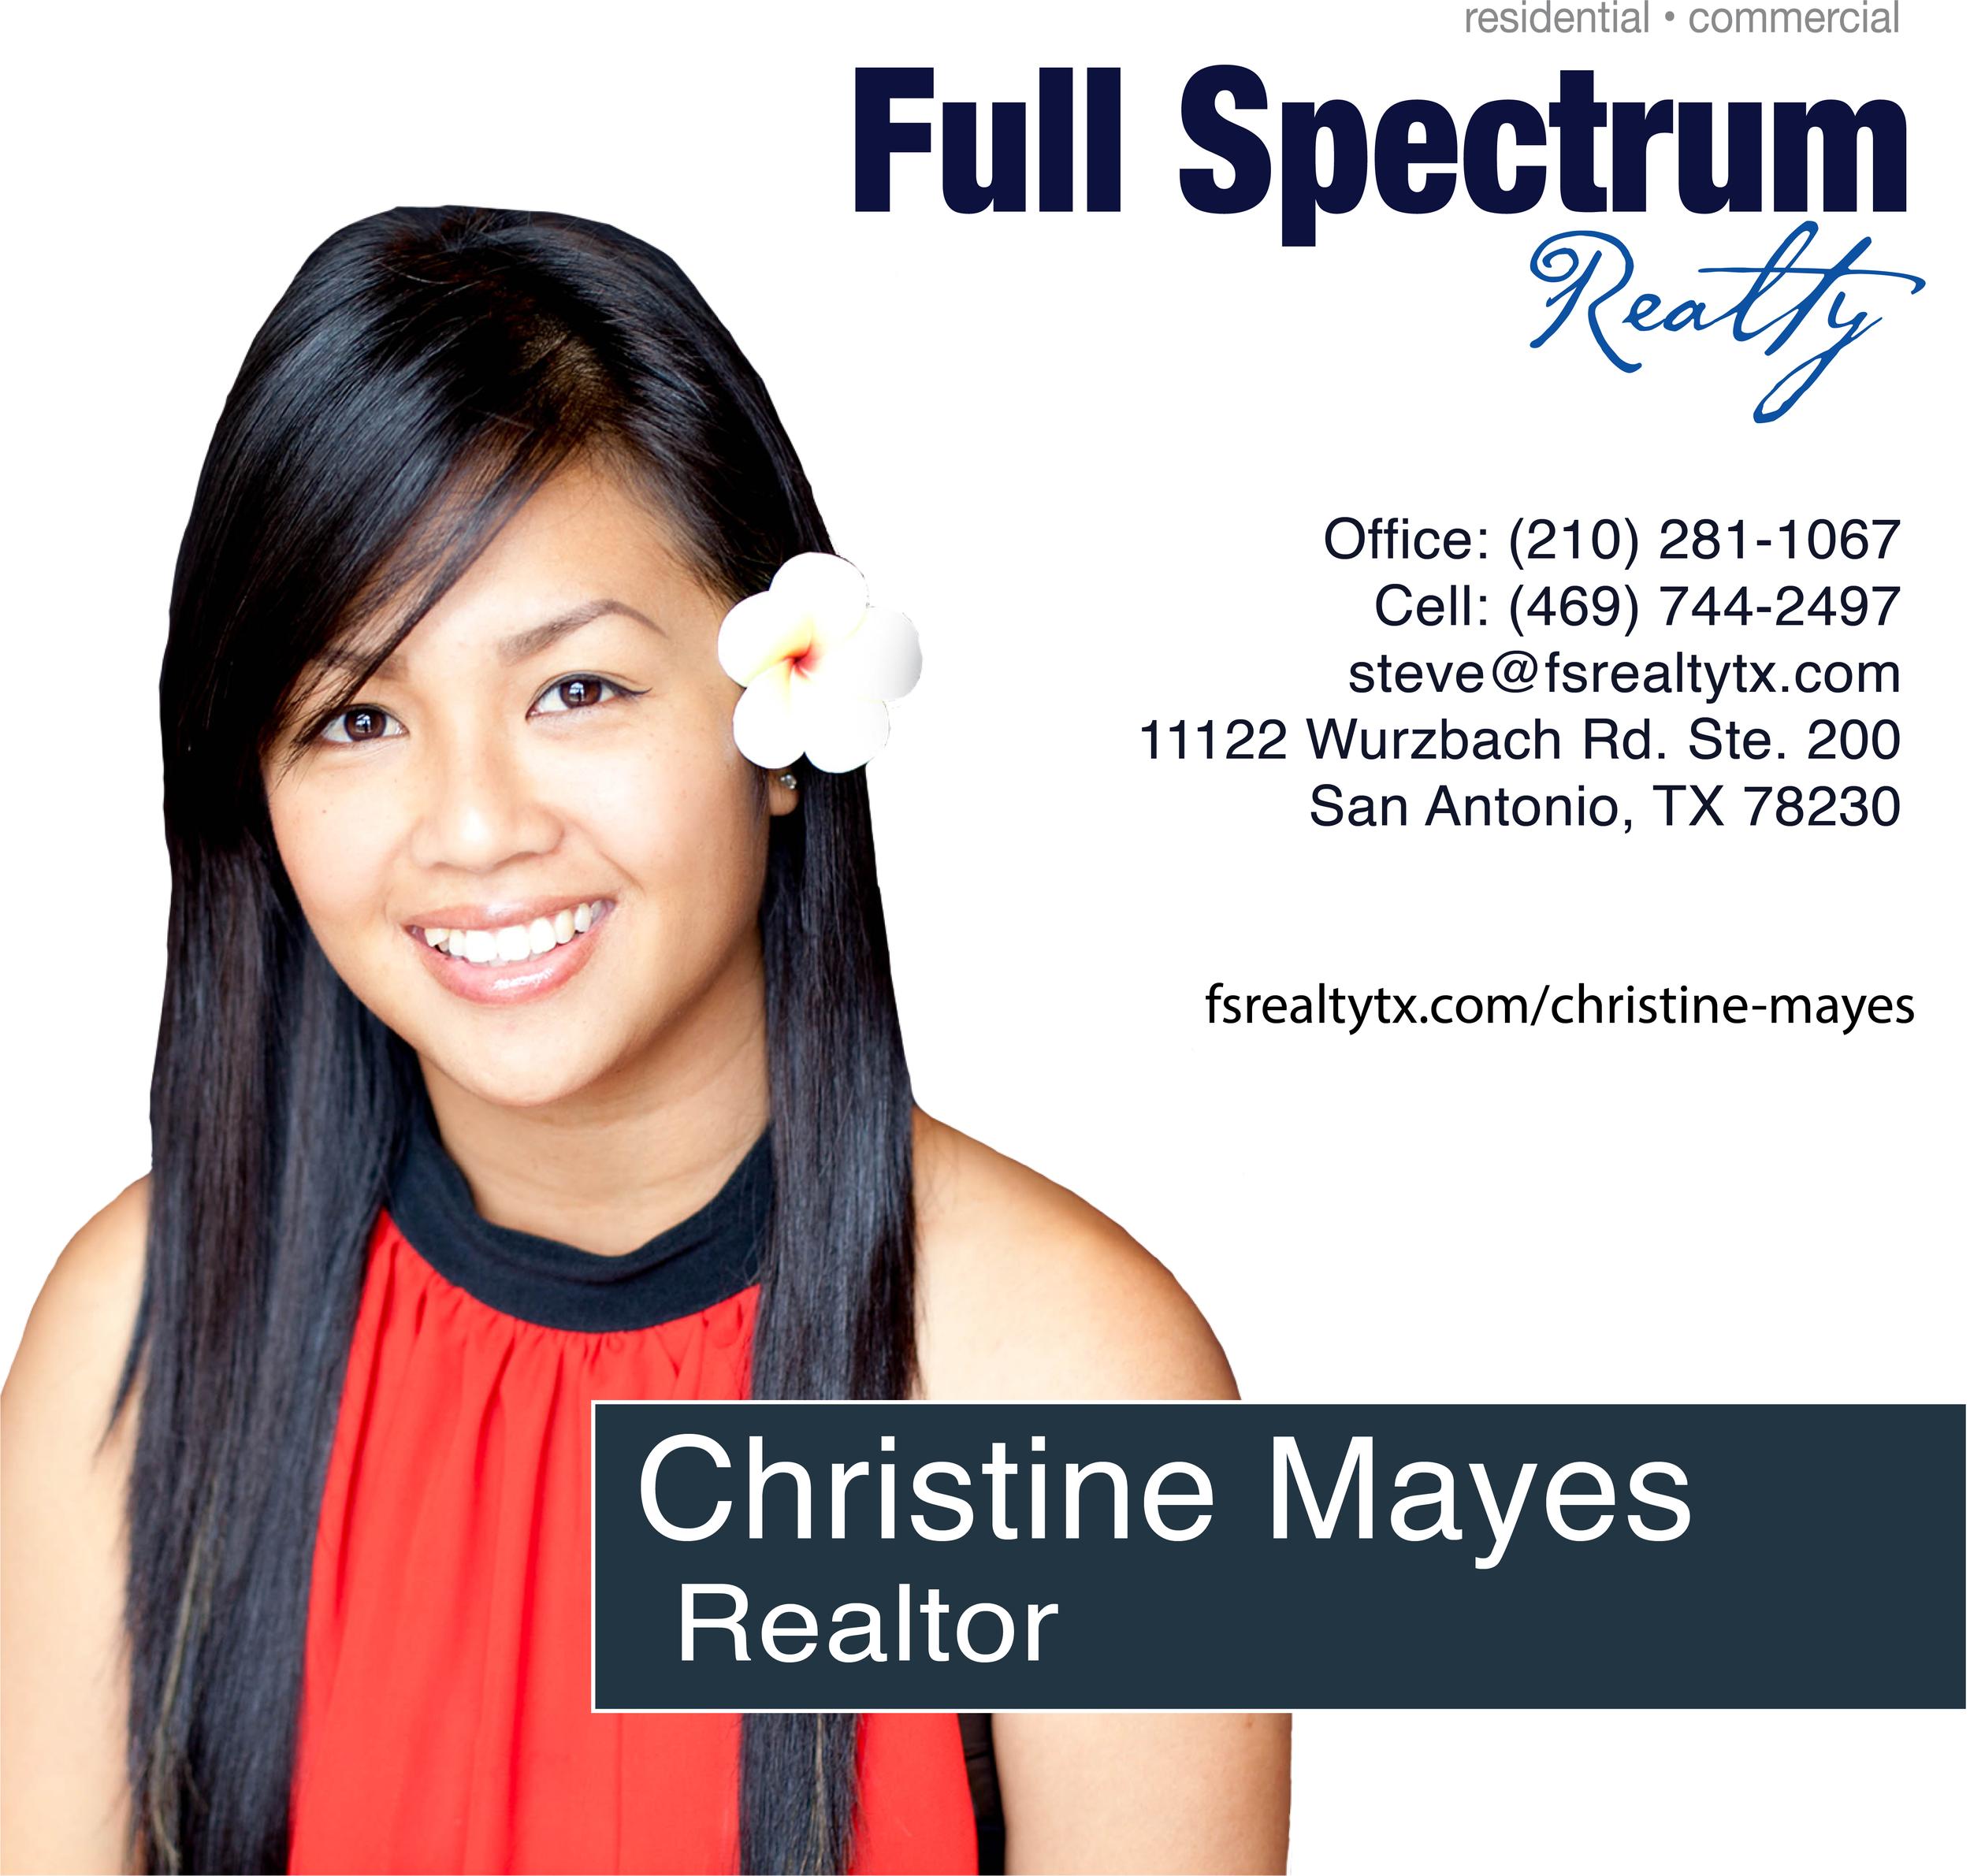 Christine Mayes